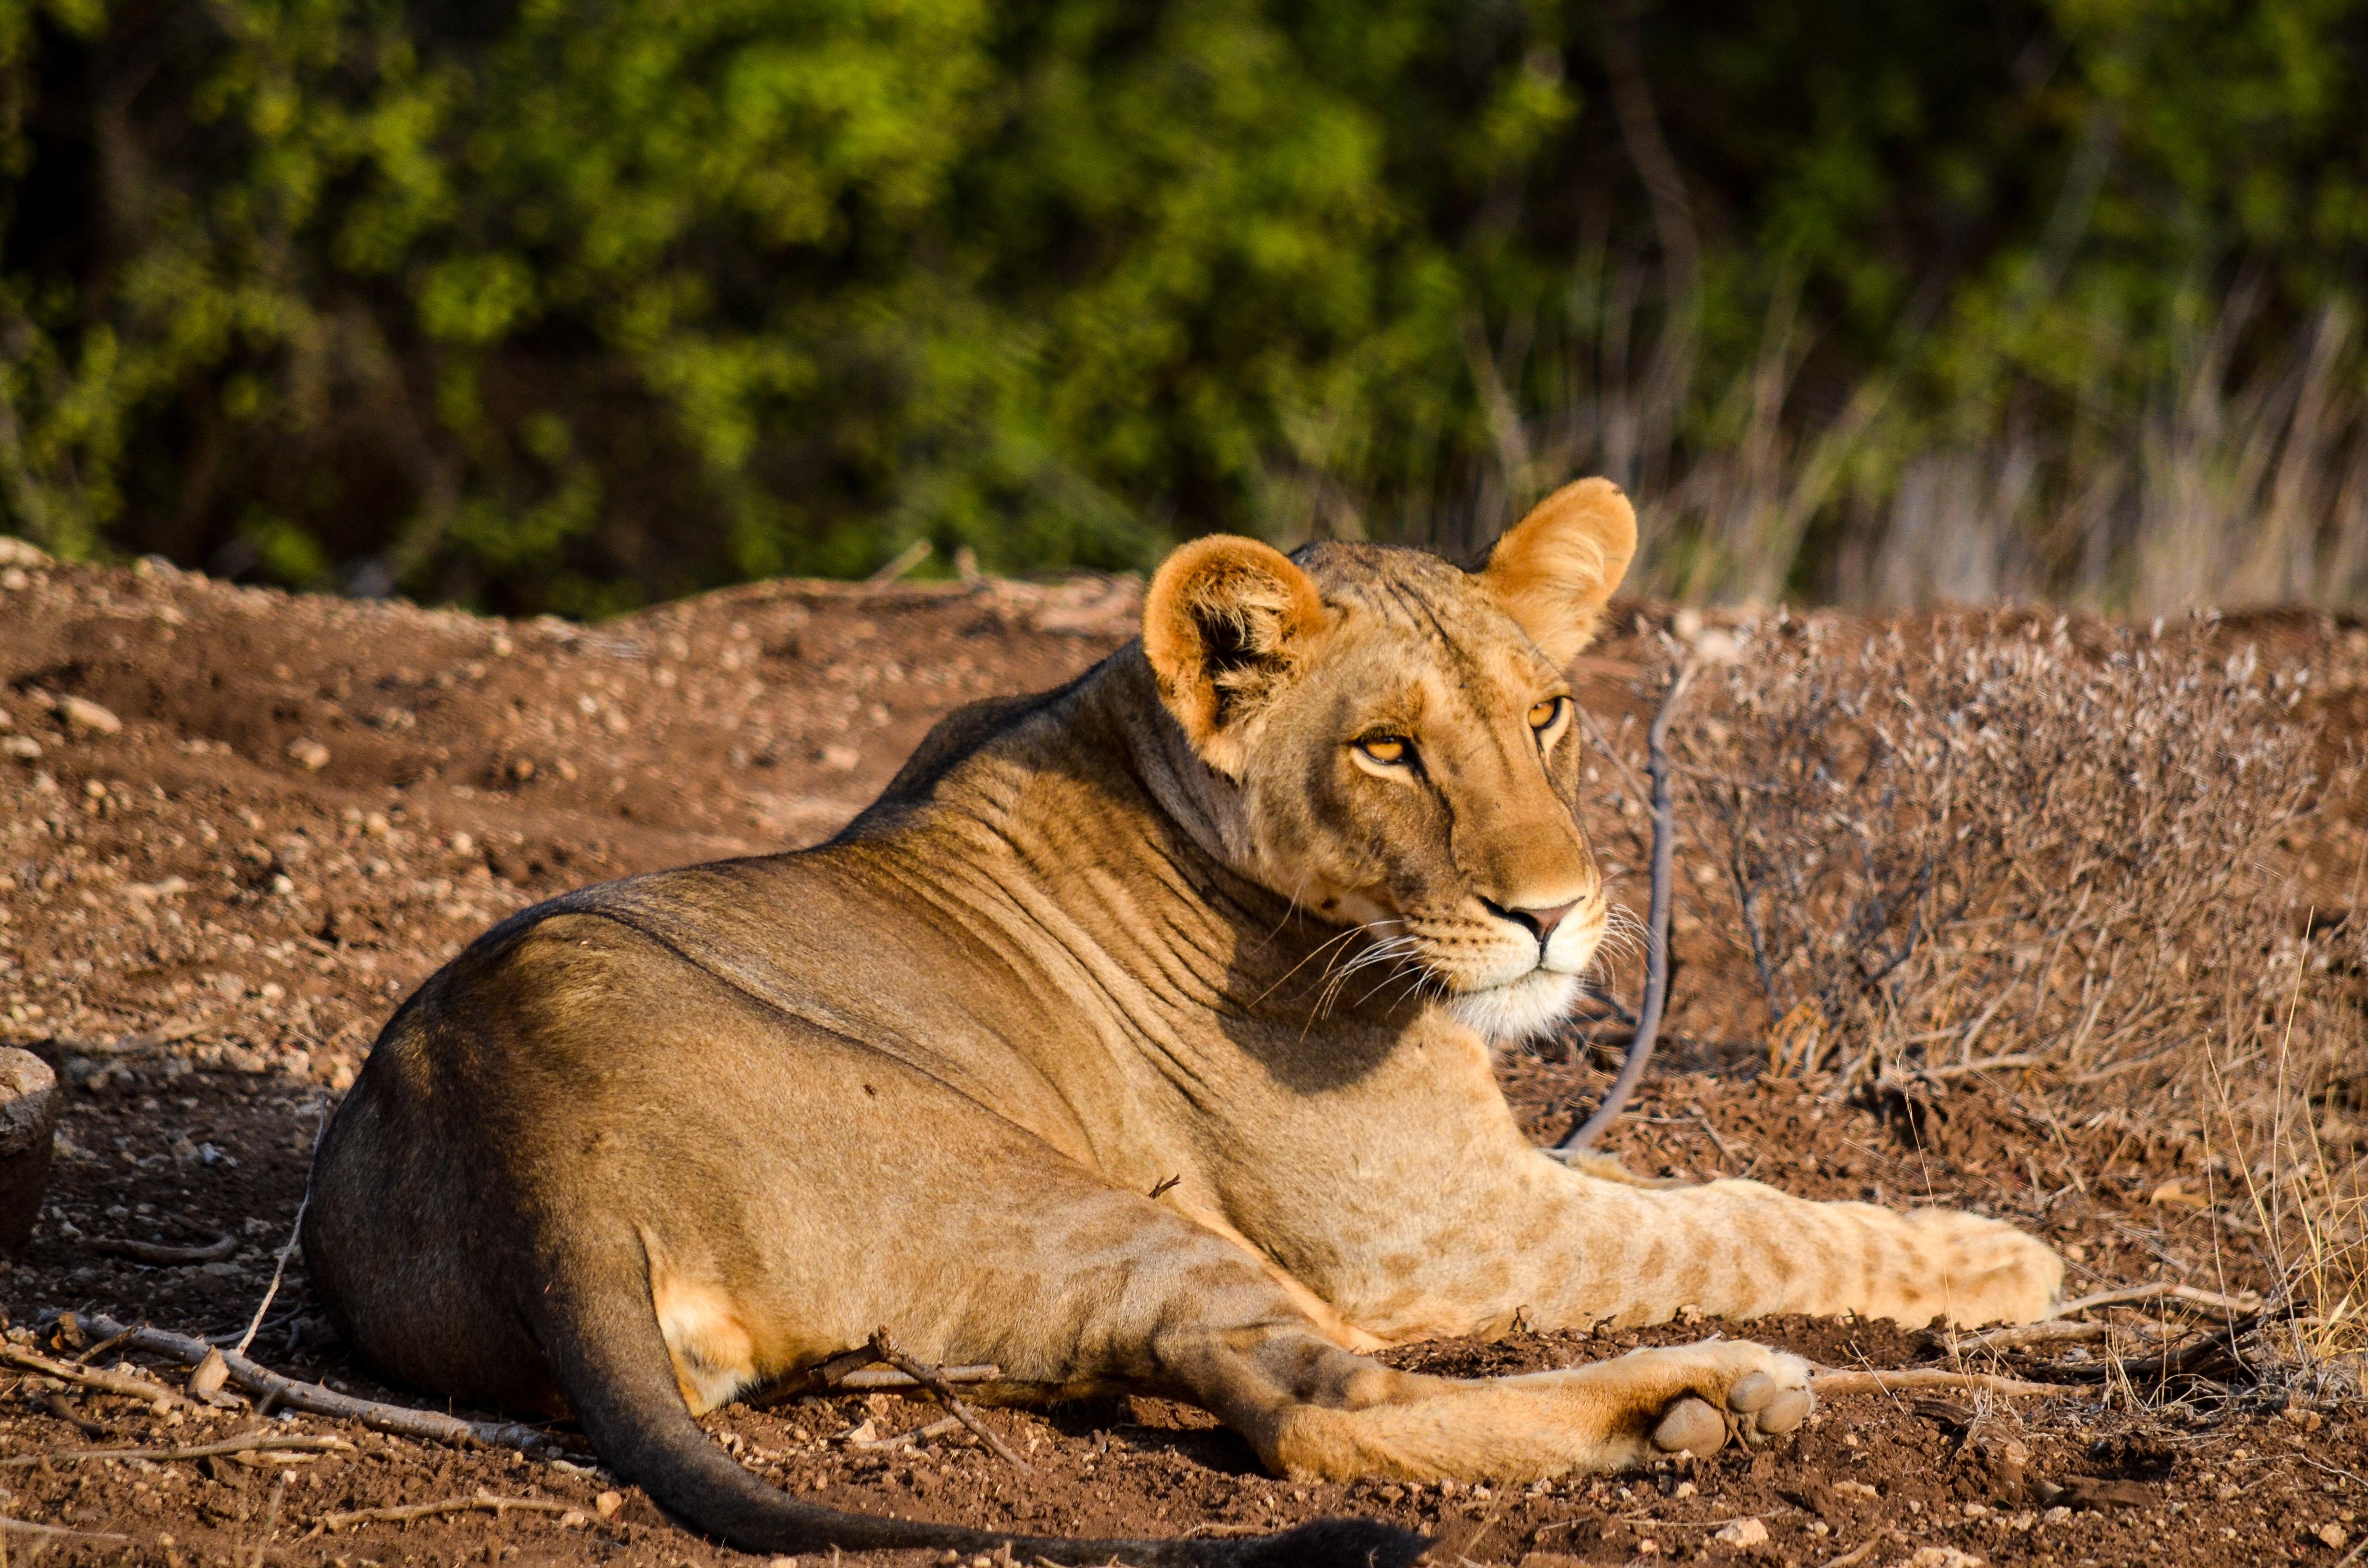 Lioness on ground photo